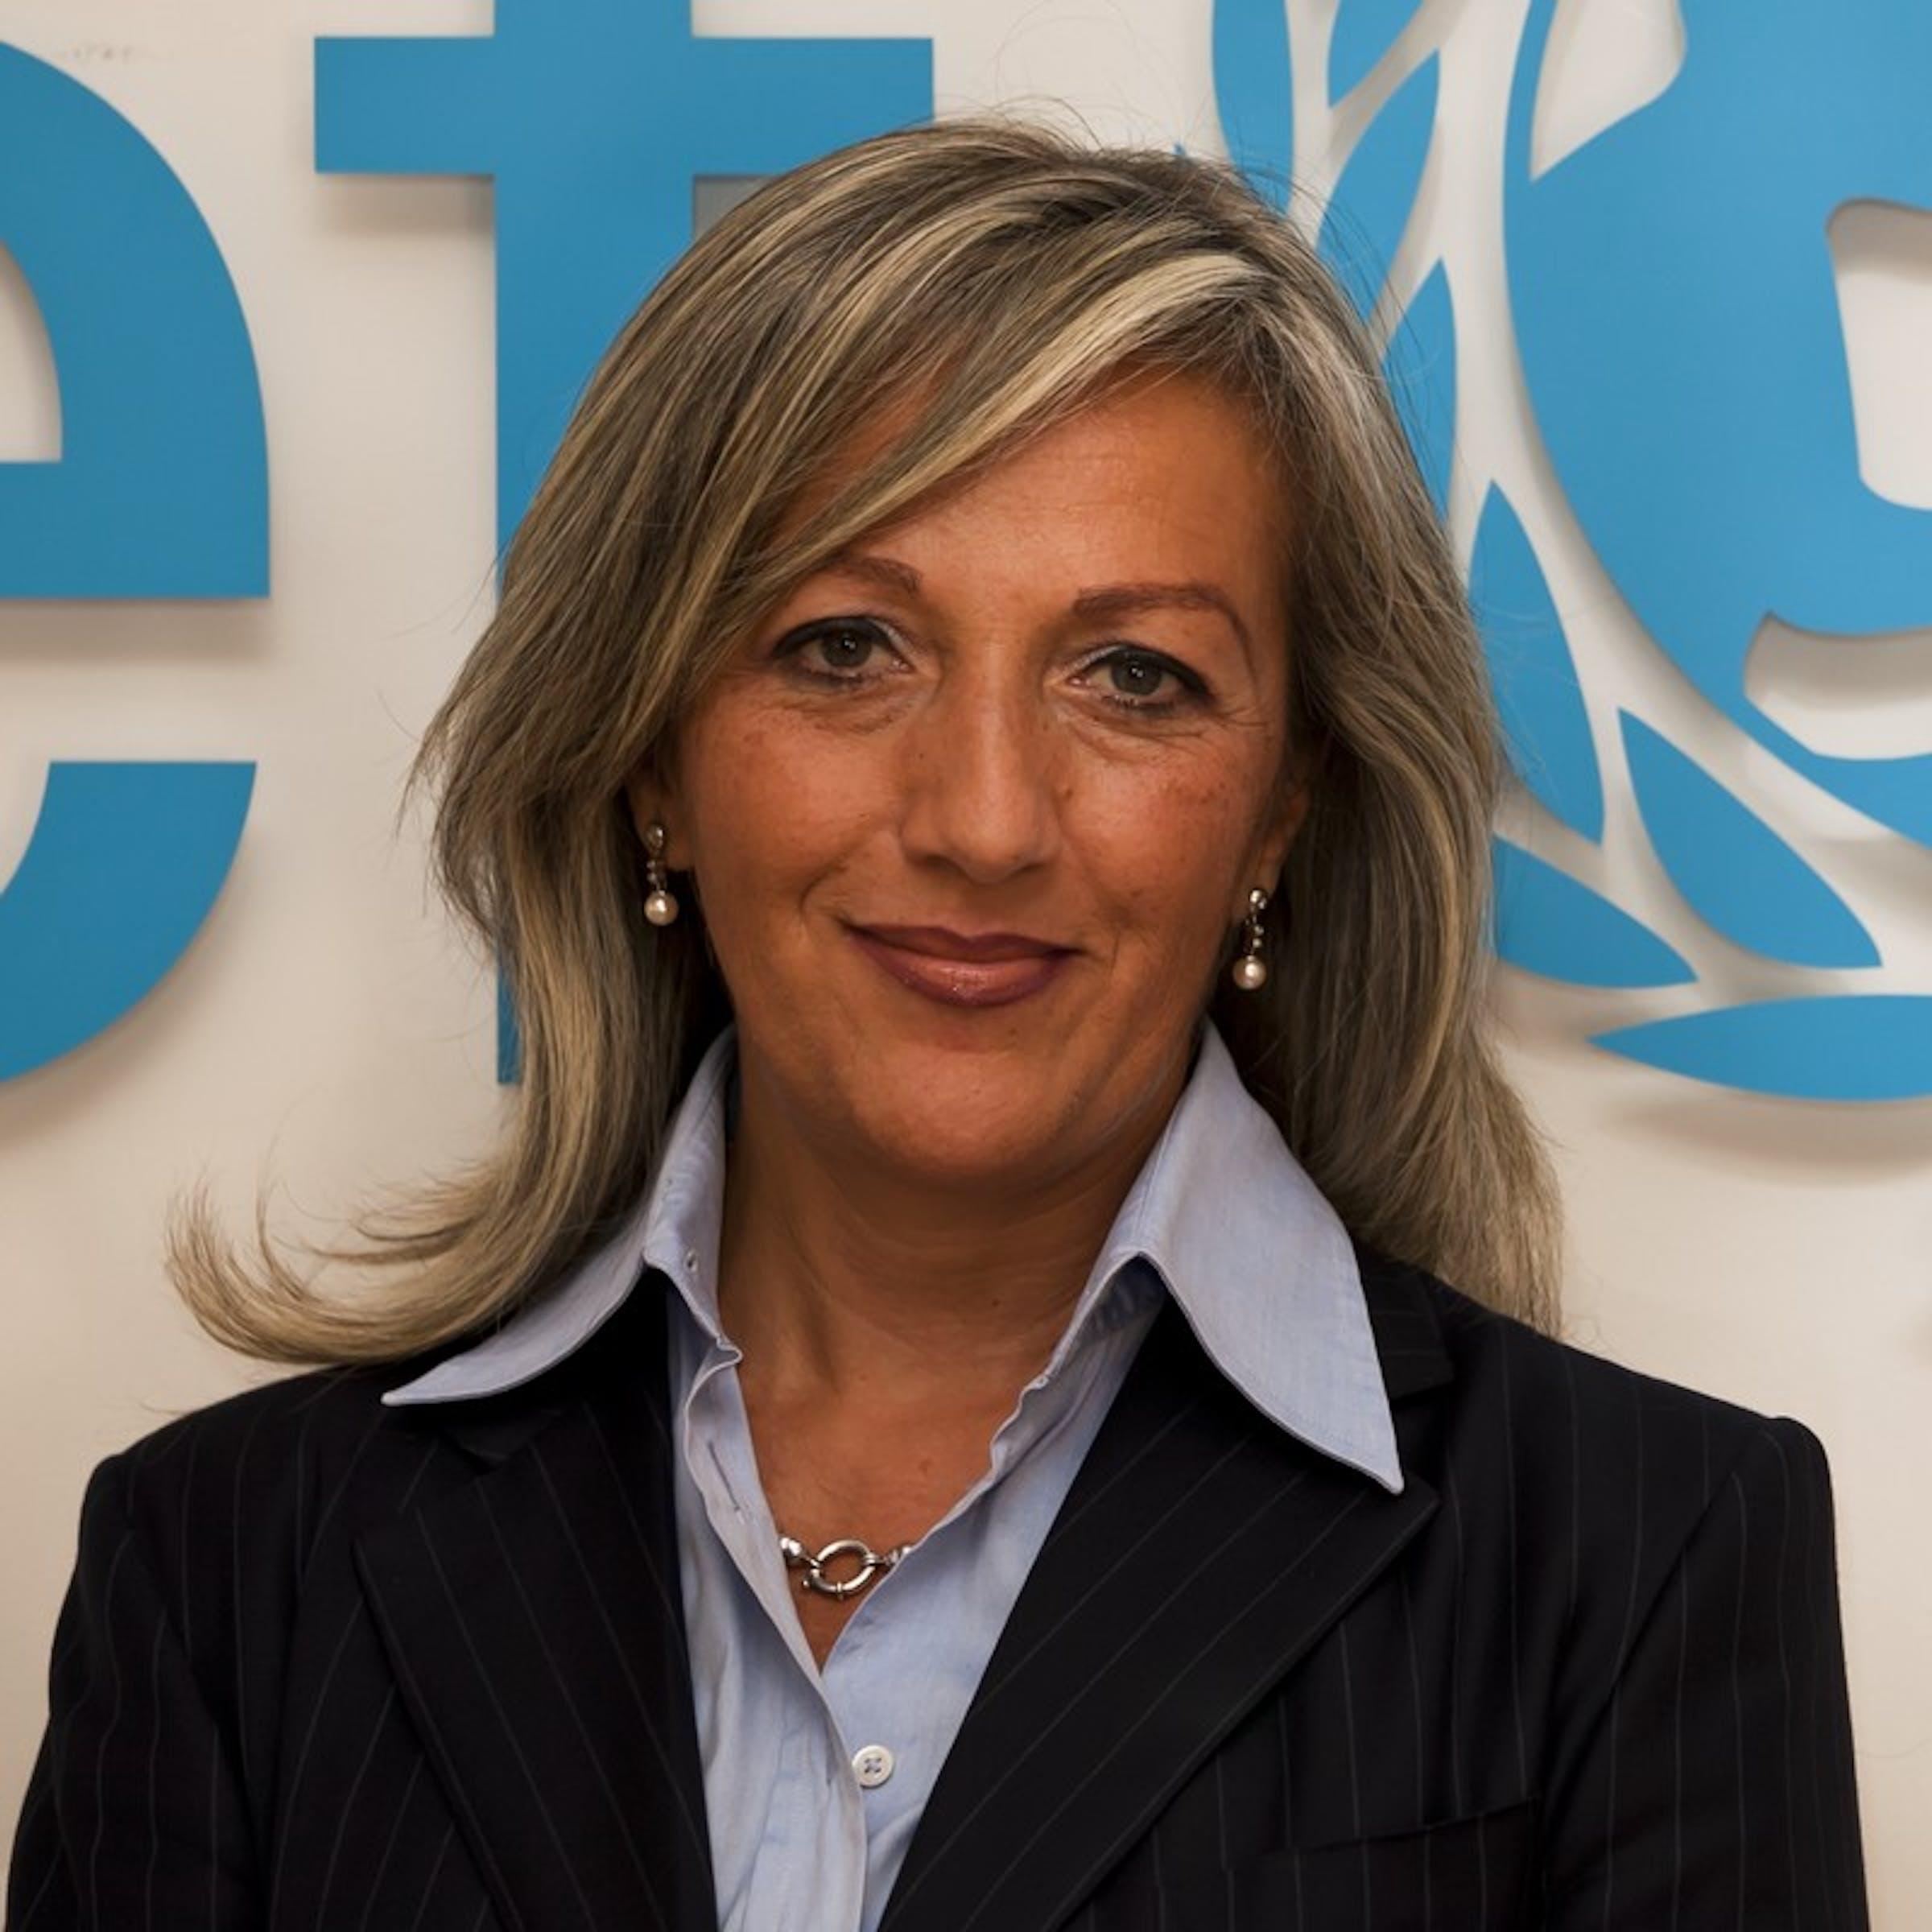 Paola Bianchi, Vicepresidente dell'UNICEF Italia - ©UNICEF Italia/2011/A.Longobardi